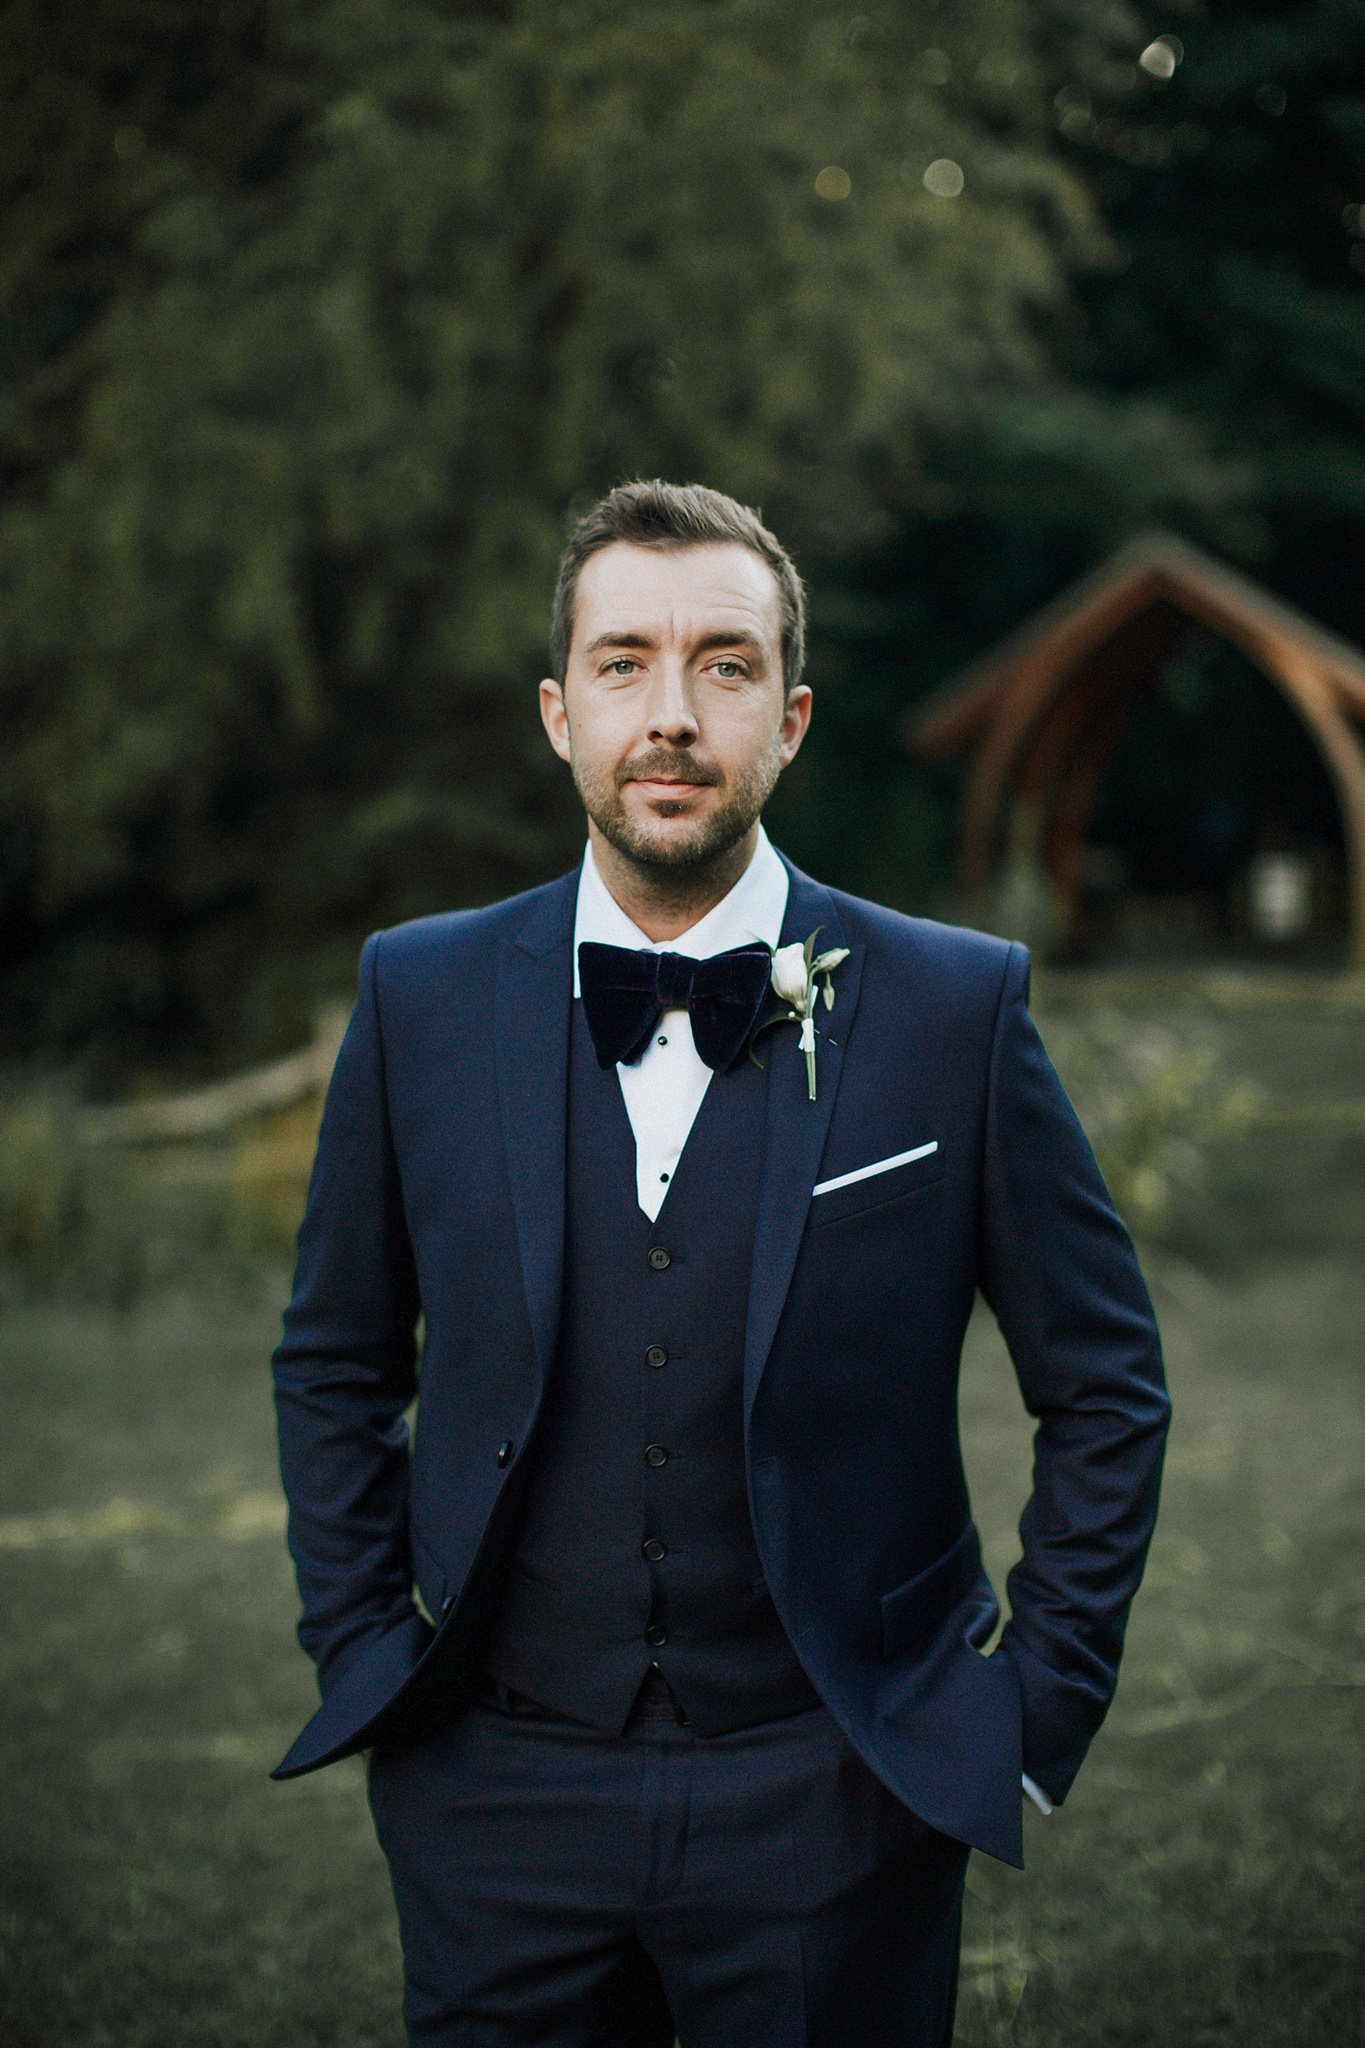 Wedding_Photography_Sheffield_0003.jpg